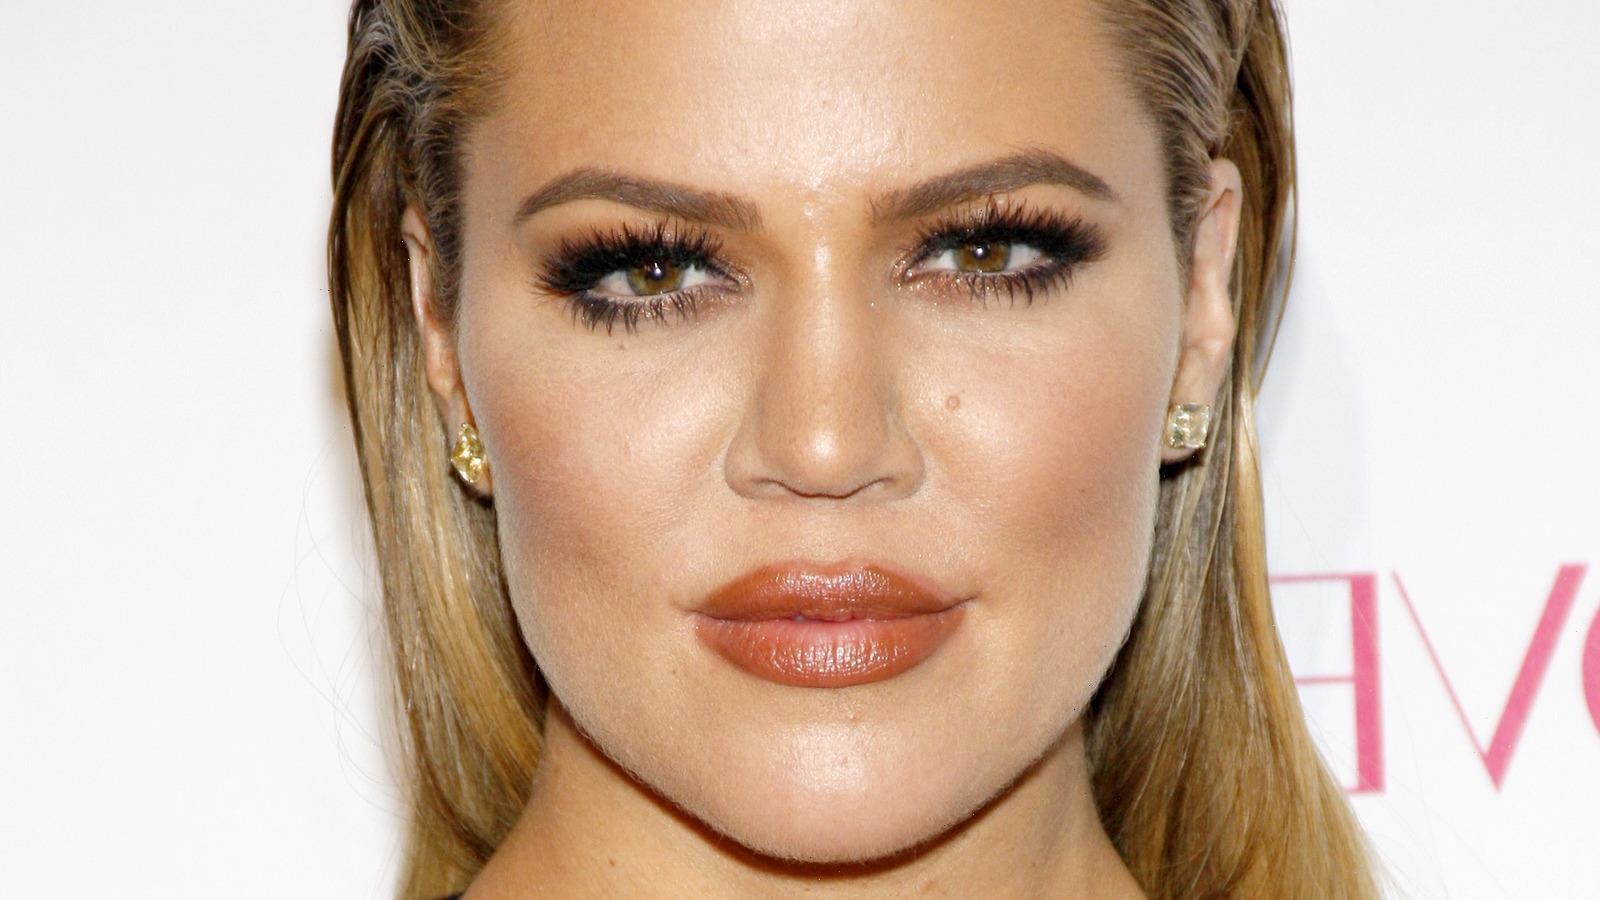 How Khloe Kardashian Really Felt About Being On Celebrity Apprentice